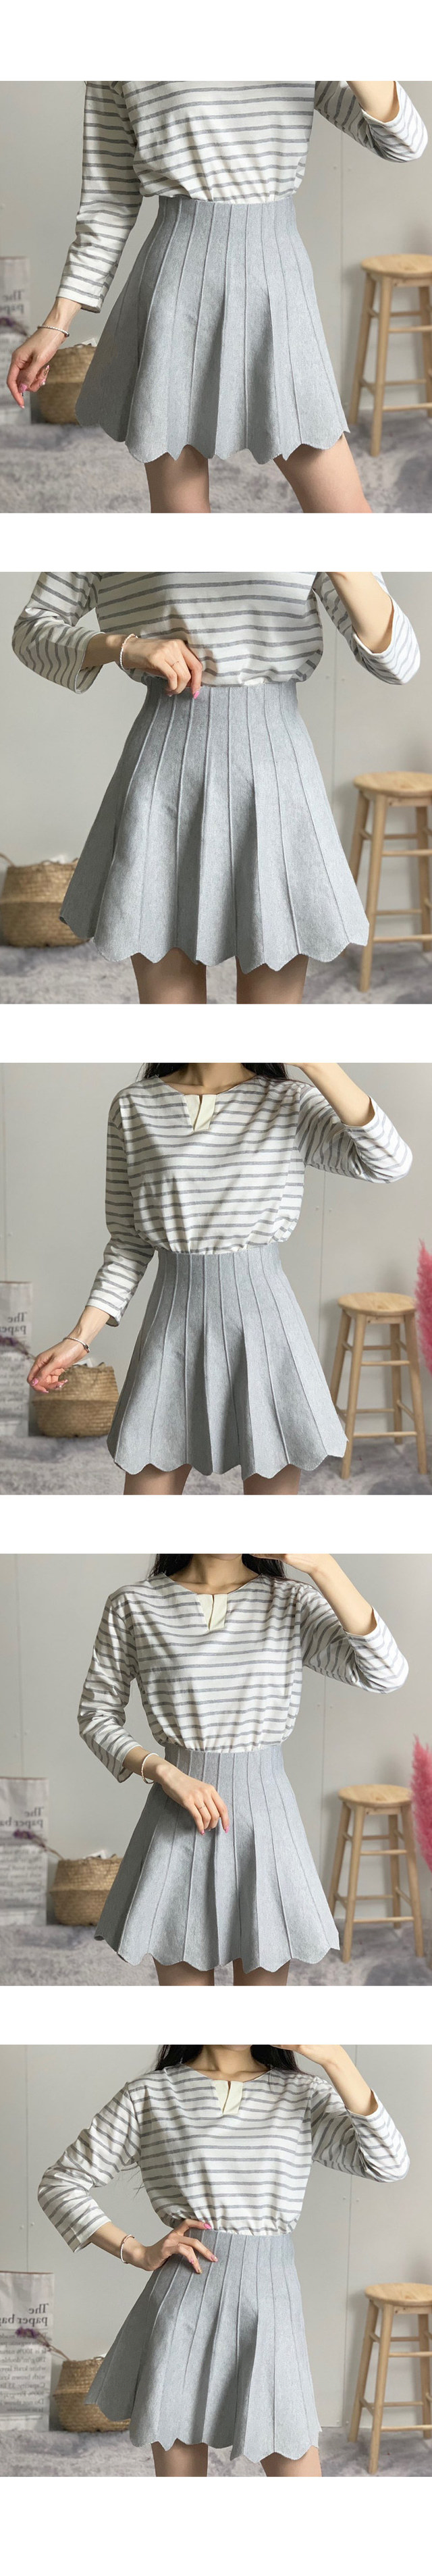 Three-step wrinkled knit skirt